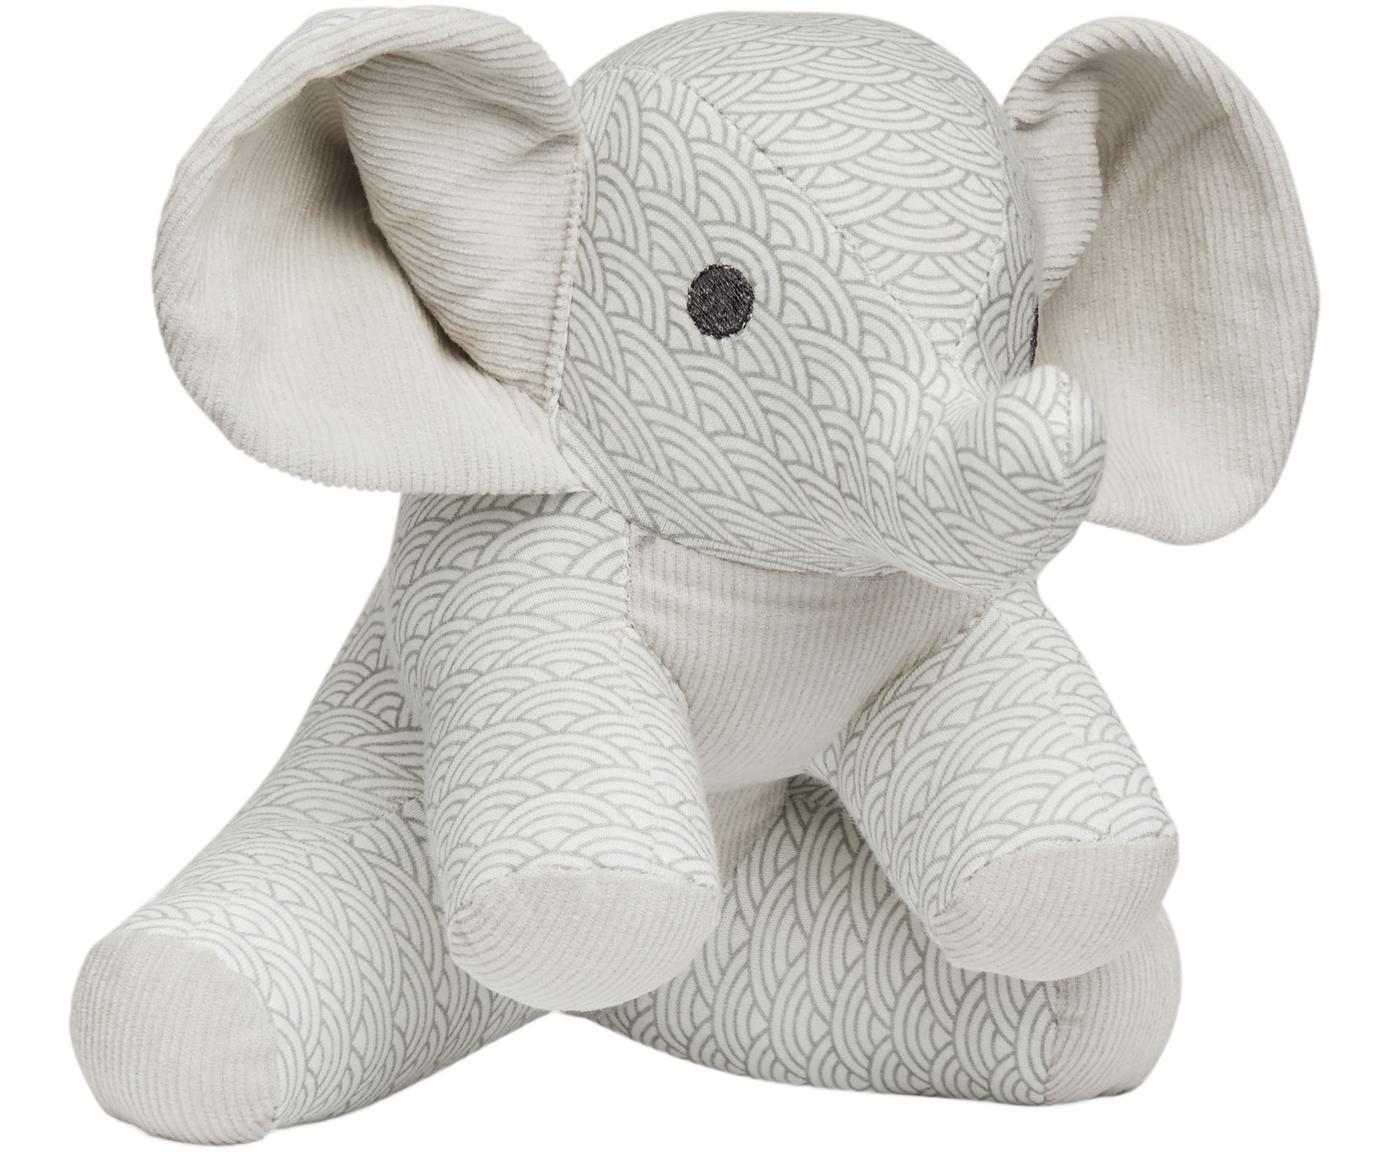 Peluche Elephant, Exterior: algodón orgánico, Gris, blanco, gris claro, An 20 x Al 21 cm